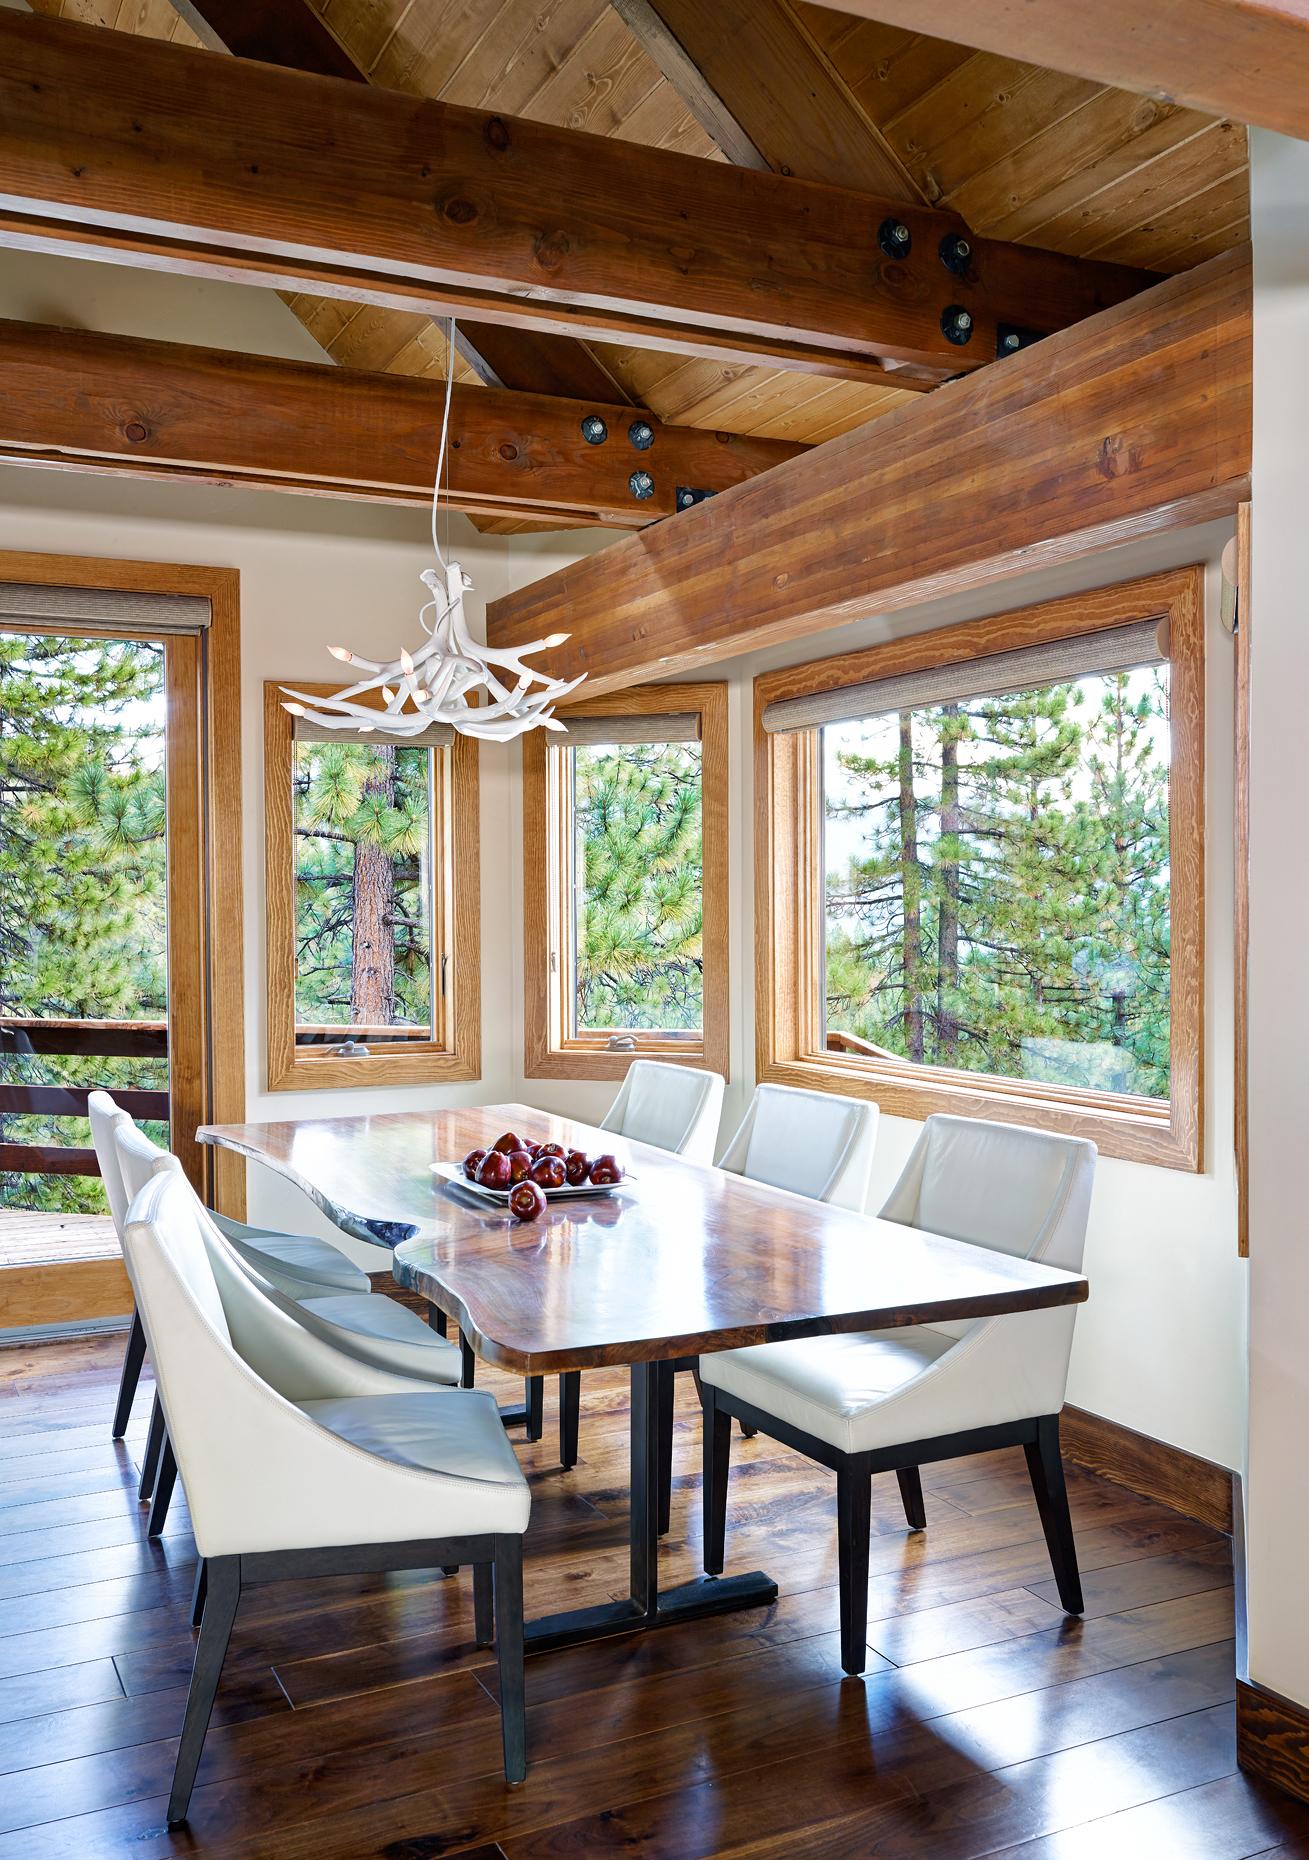 Nikal_C_lake_Tahoe_Home_5.jpg